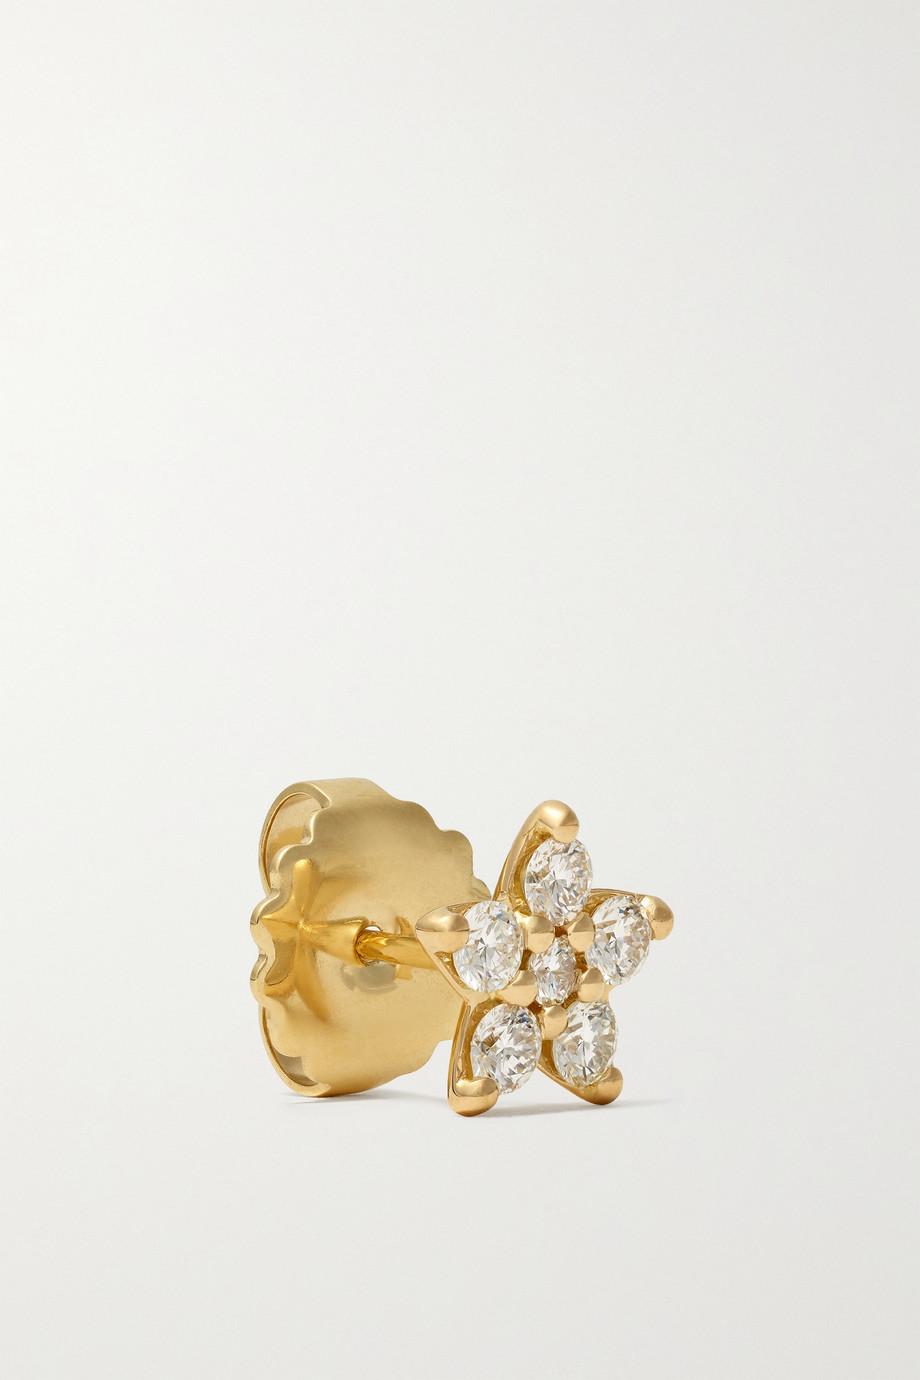 OLE LYNGGAARD COPENHAGEN Shooting Stars Ohrringe aus 18 Karat Gold mit Diamanten